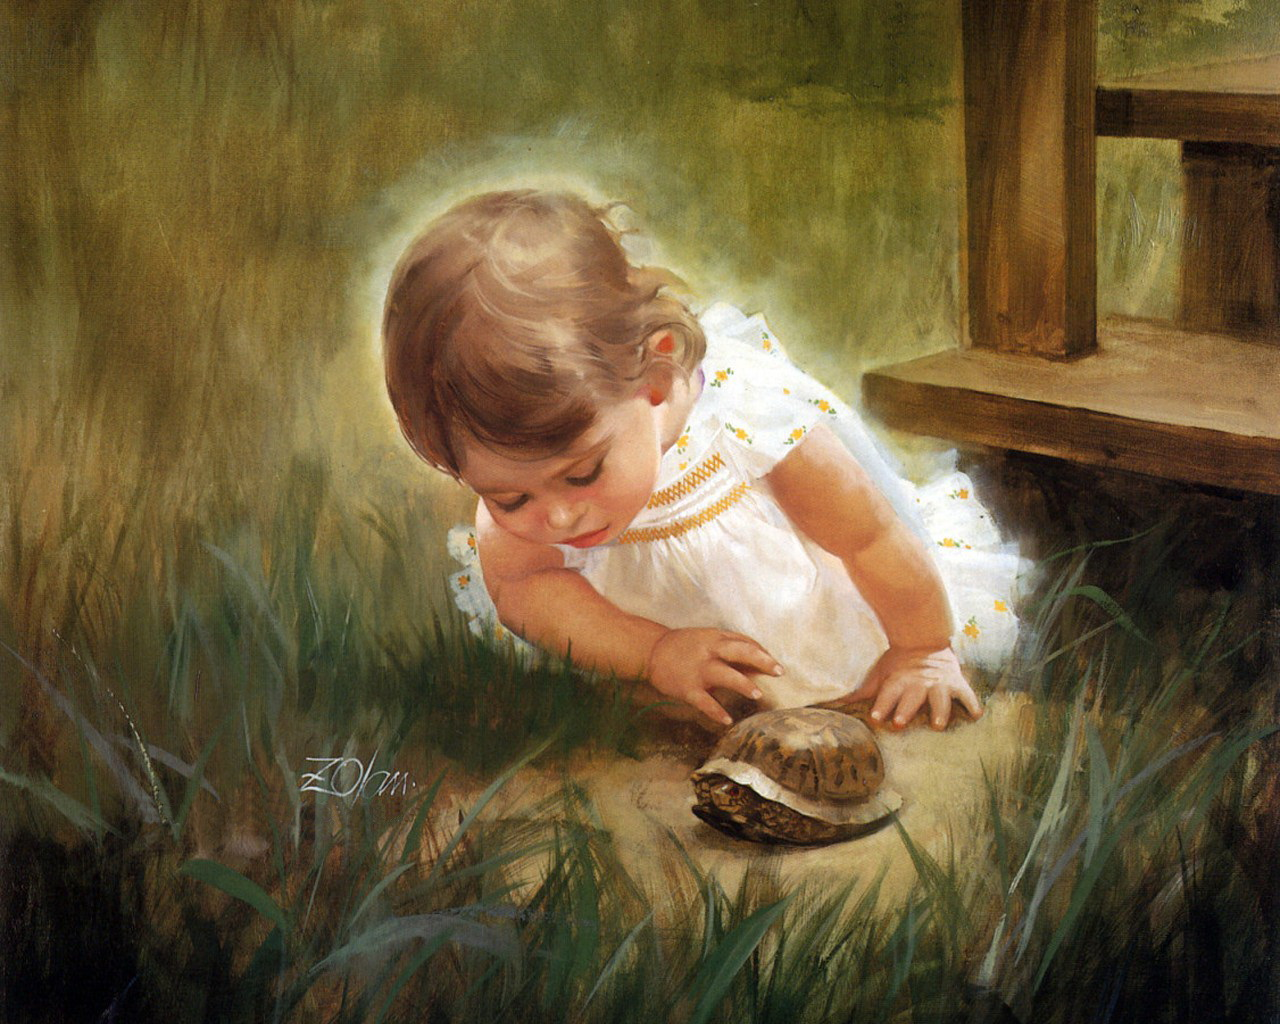 Favoloso Quadri Di Bambini UP24 » Regardsdefemmes HB88